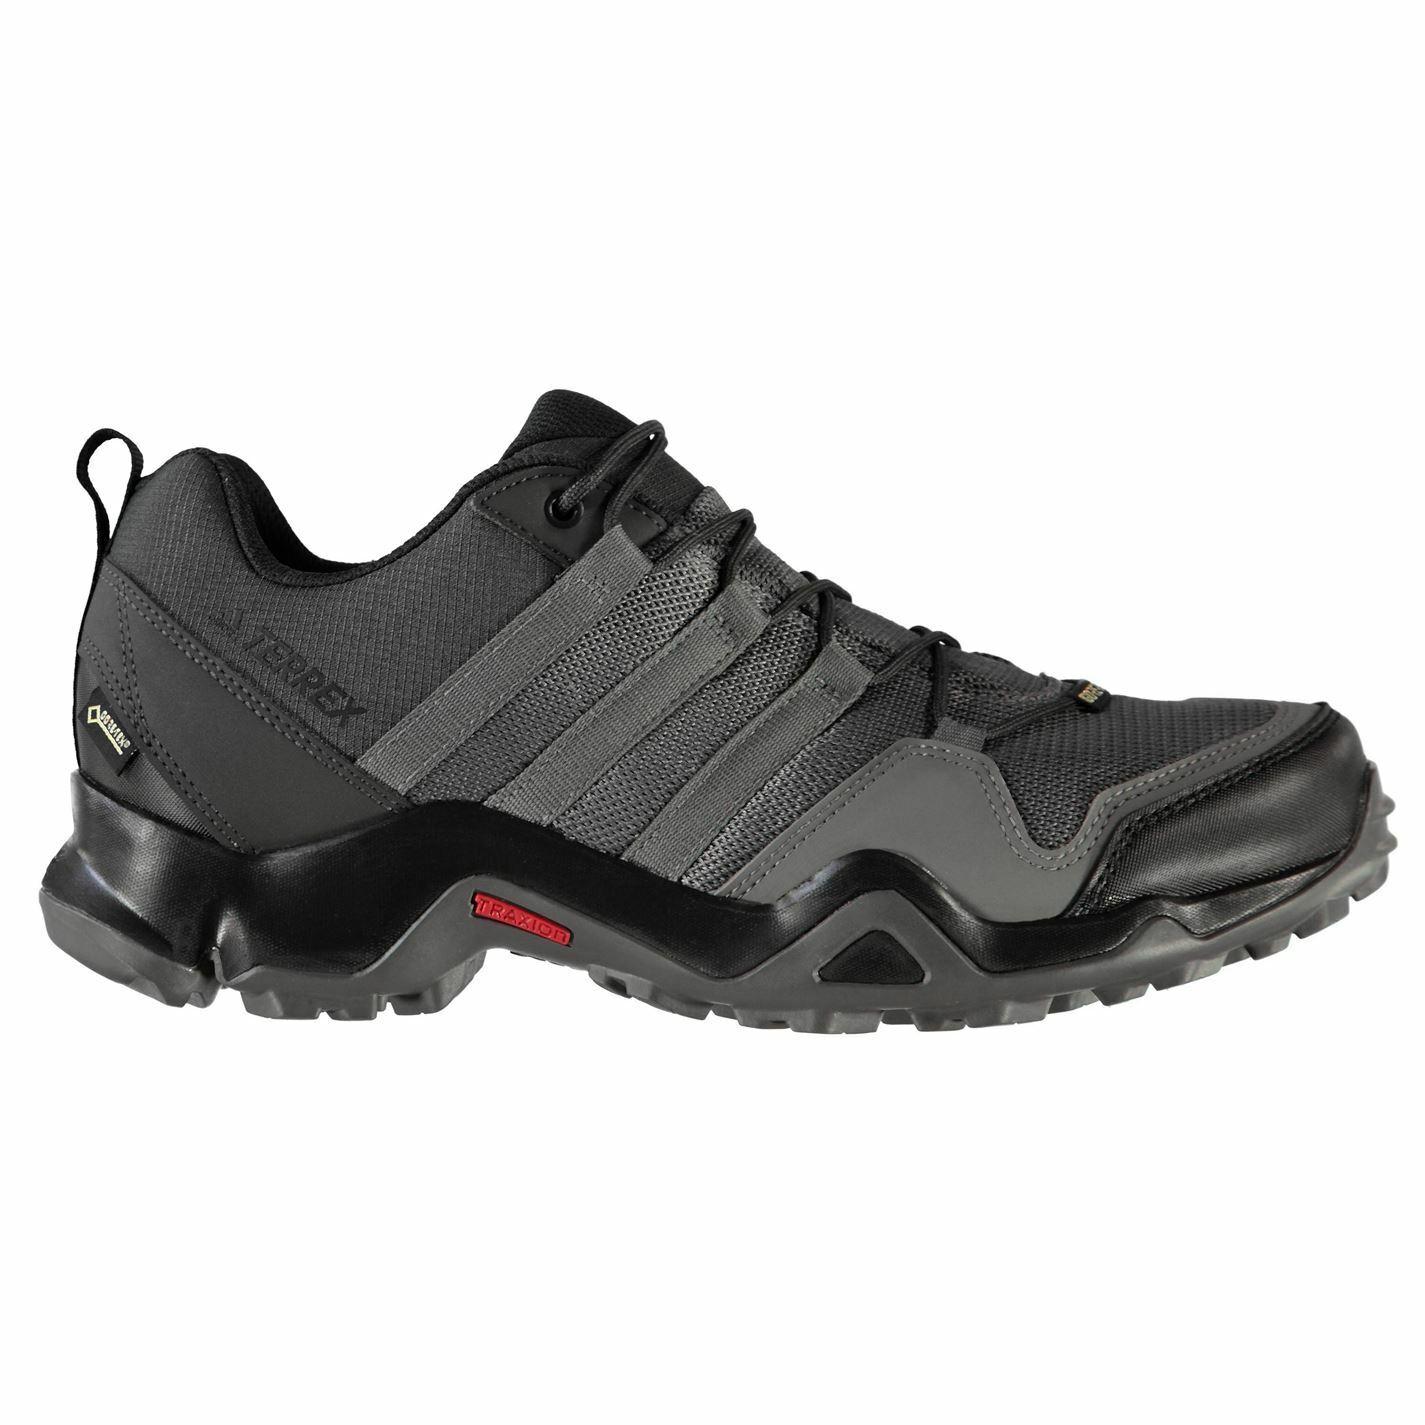 Adidas mannens TERREX AX2R GTX wandelen schoenen WaterBesteendig Lace Up Adembbare Gore Tex